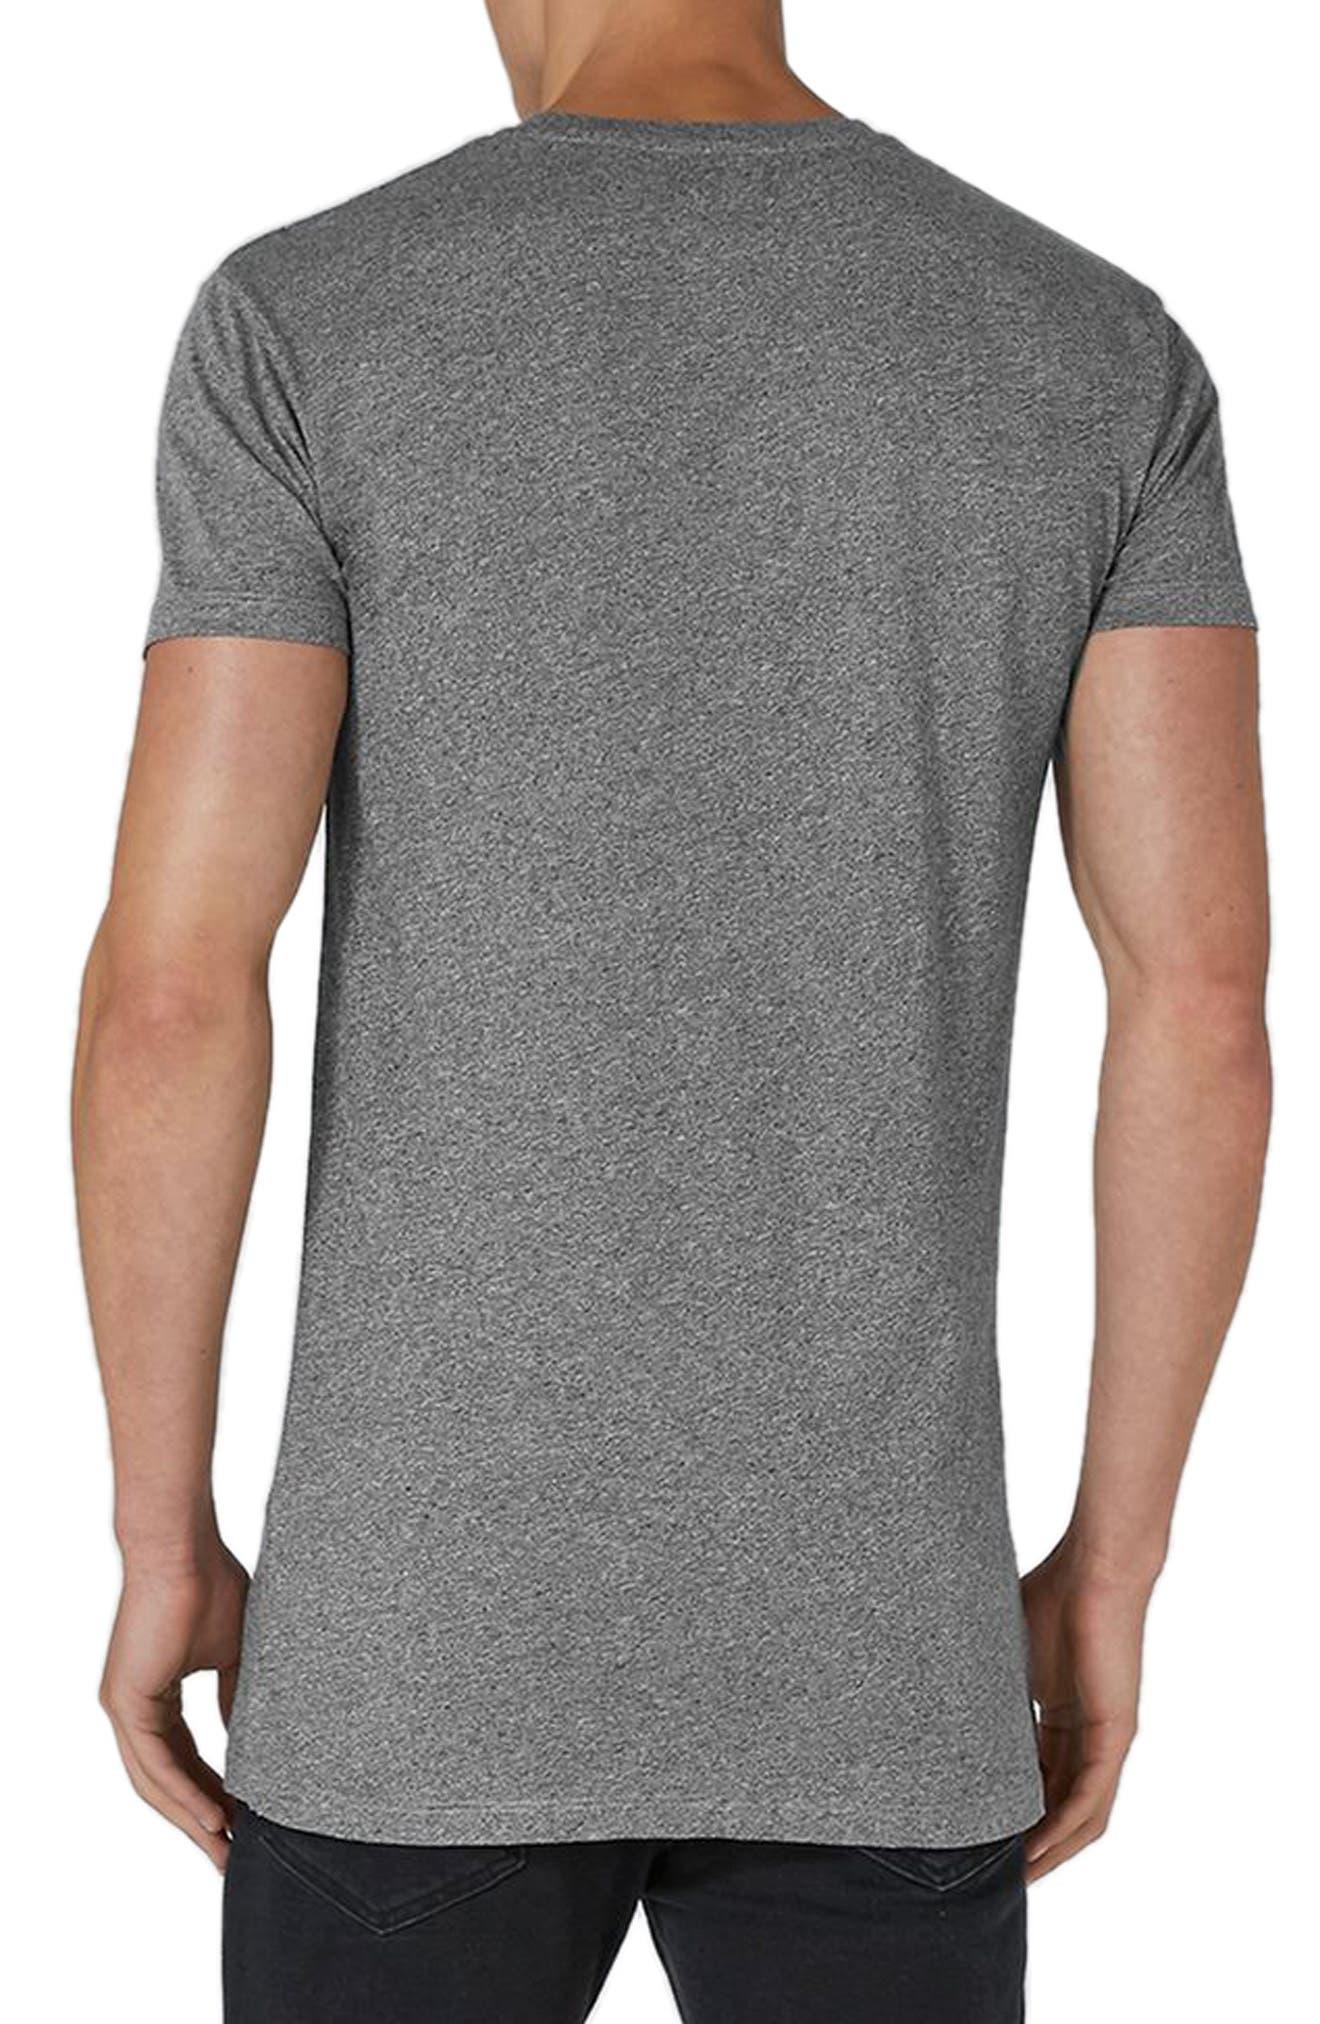 Muscle Fit Longline T-Shirt,                             Alternate thumbnail 2, color,                             Grey